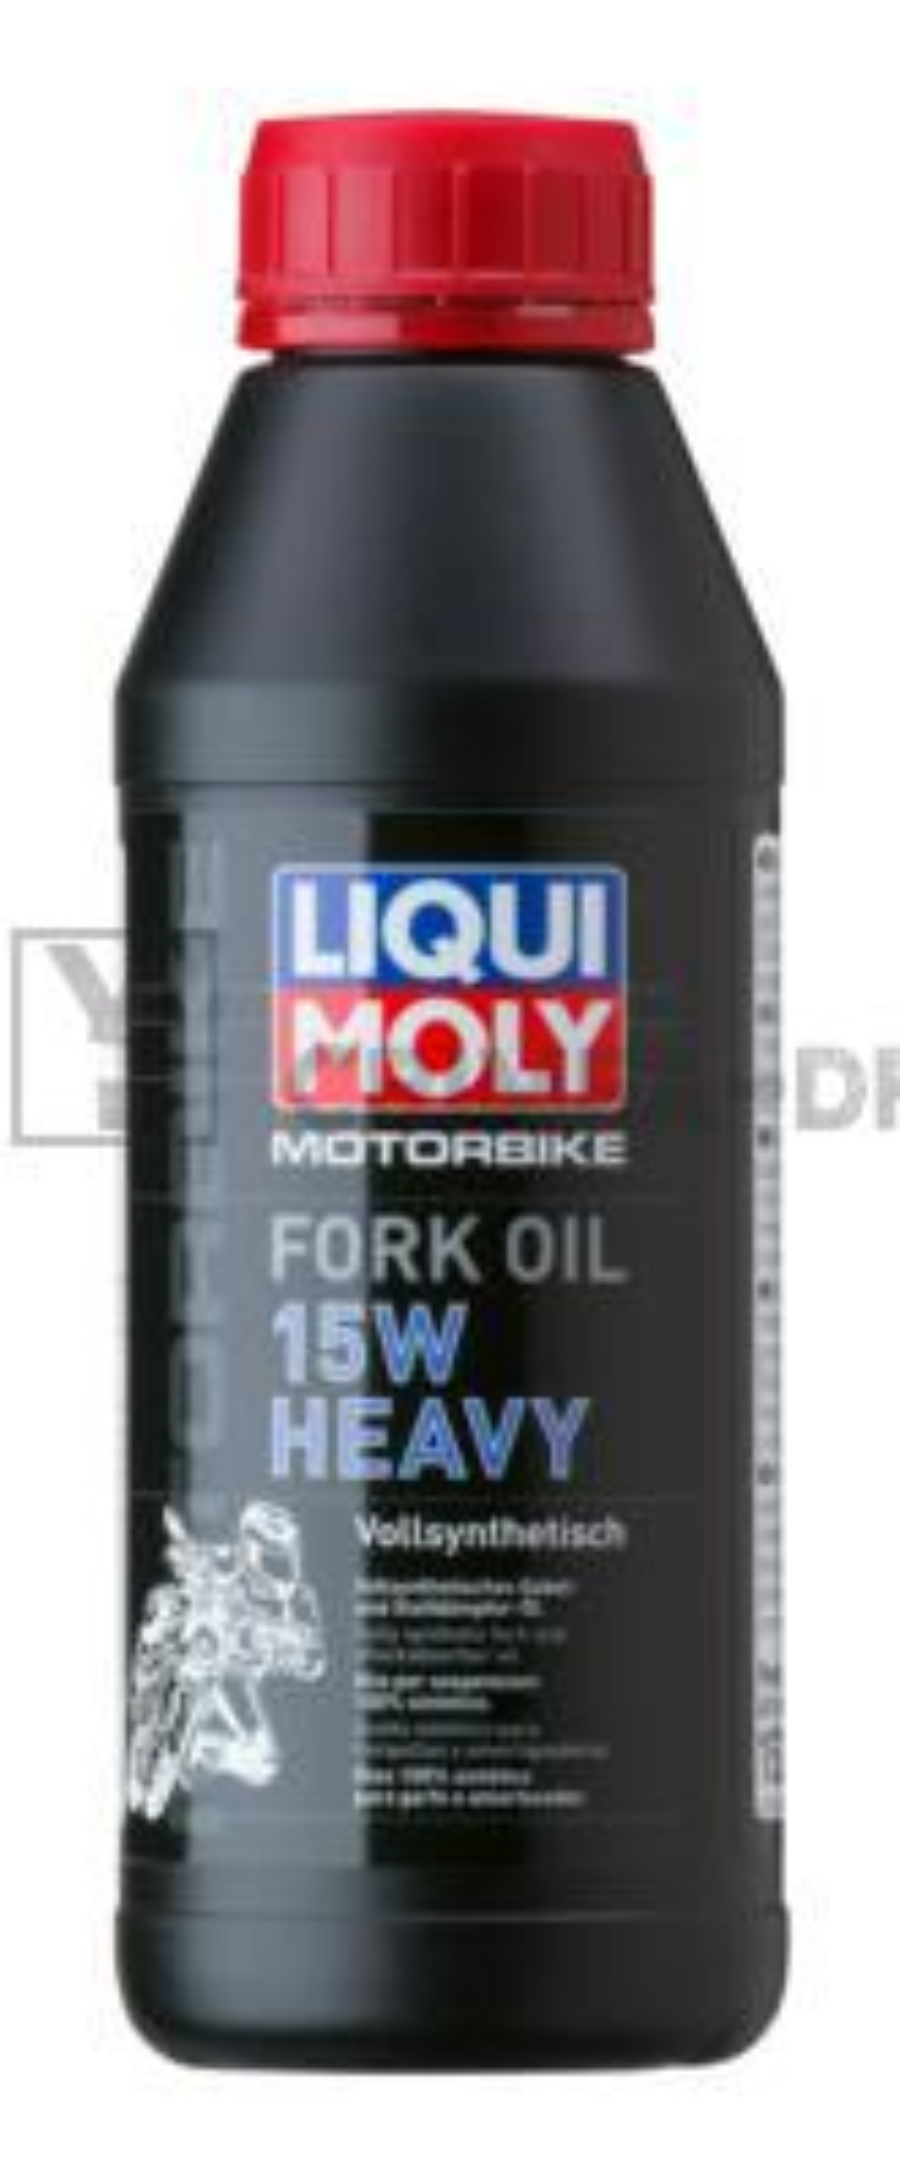 Синтетическое масло для вилок и амортизаторов Motorbike Fork Oil Heavy 15W 0,5л